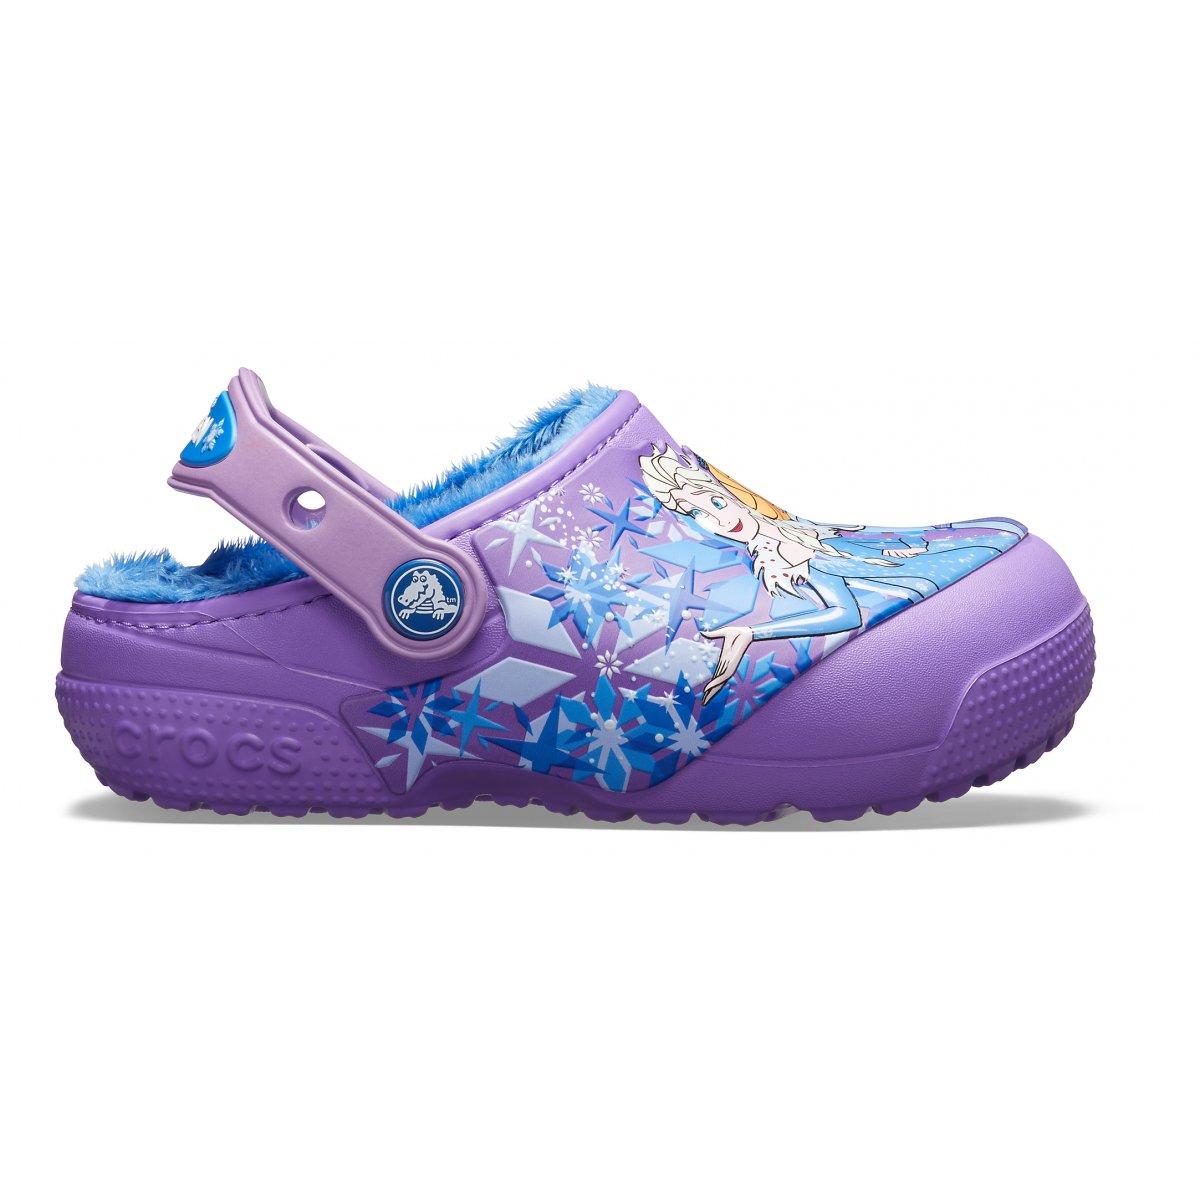 e15413db1abe Kids  Crocs Fun Lab Lined Frozen Clog - Collezione Invernale Footwear  Bambina